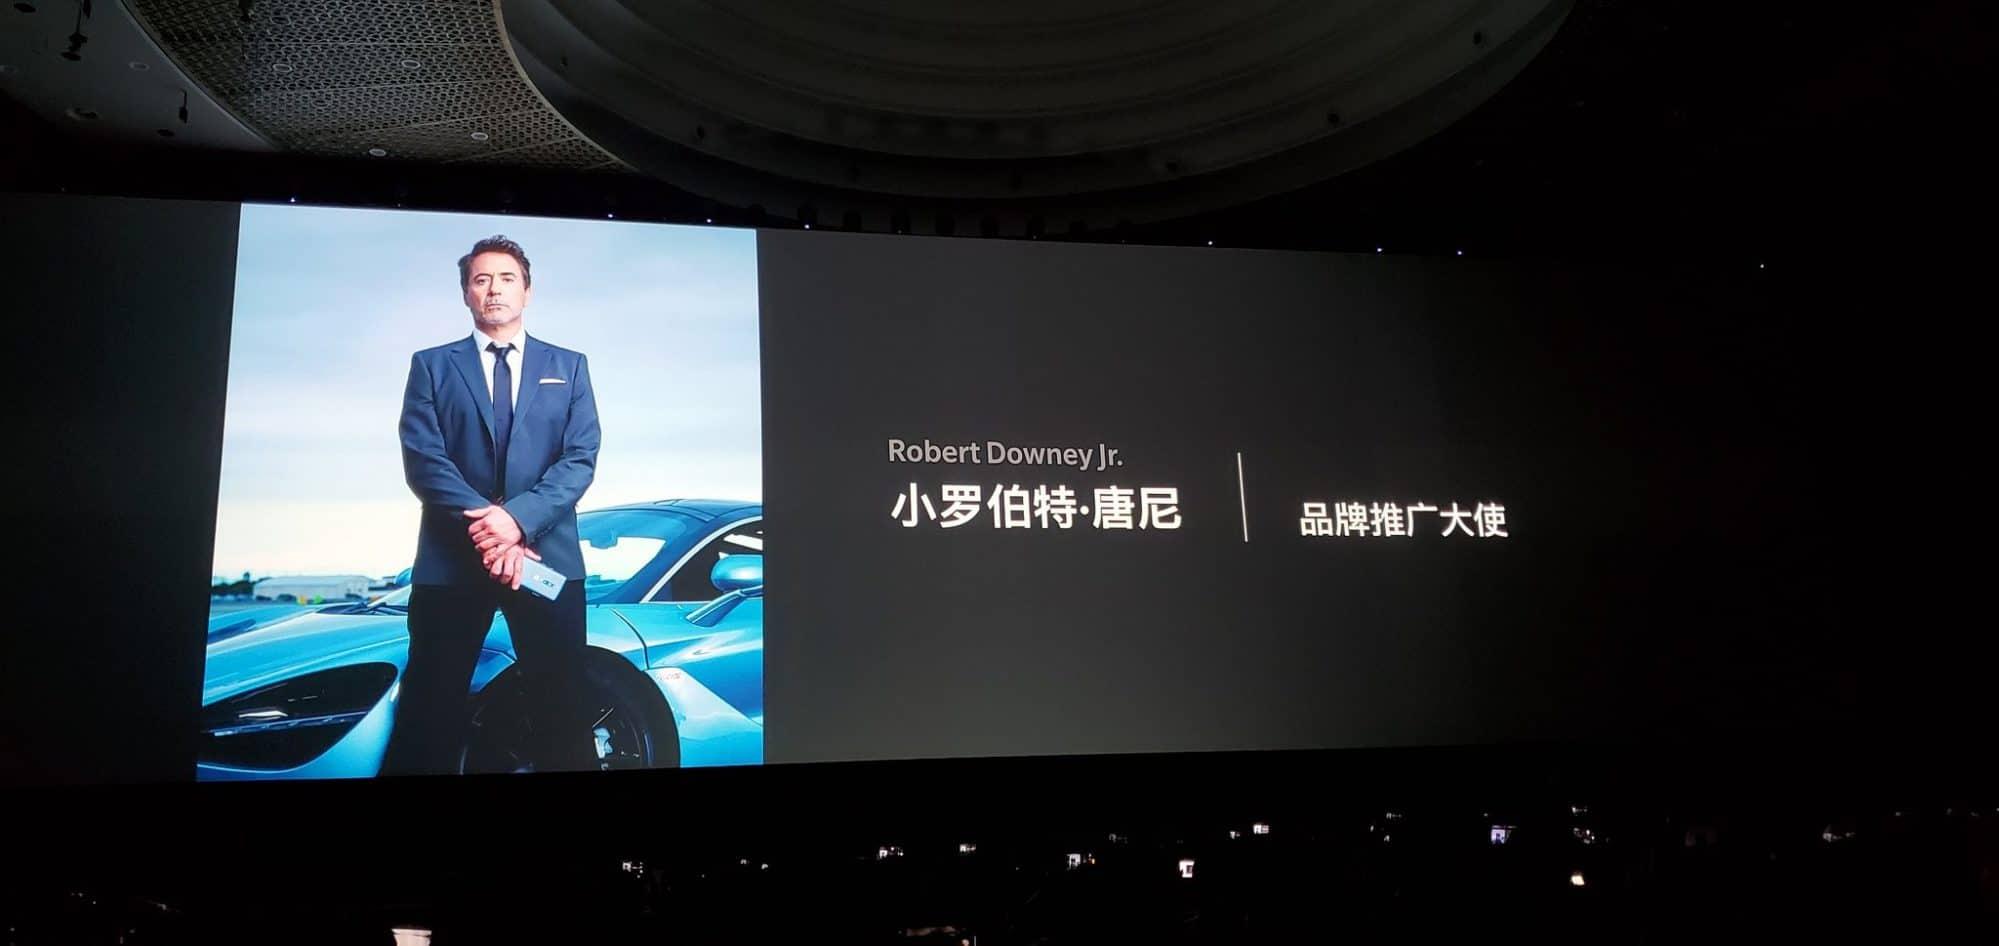 oneplus ตั้ง robert downey jr. เป็น brand ambassador คนล่าสุด - OnePlus ตั้ง Robert Downey Jr. เป็น Brand Ambassador คนล่าสุด